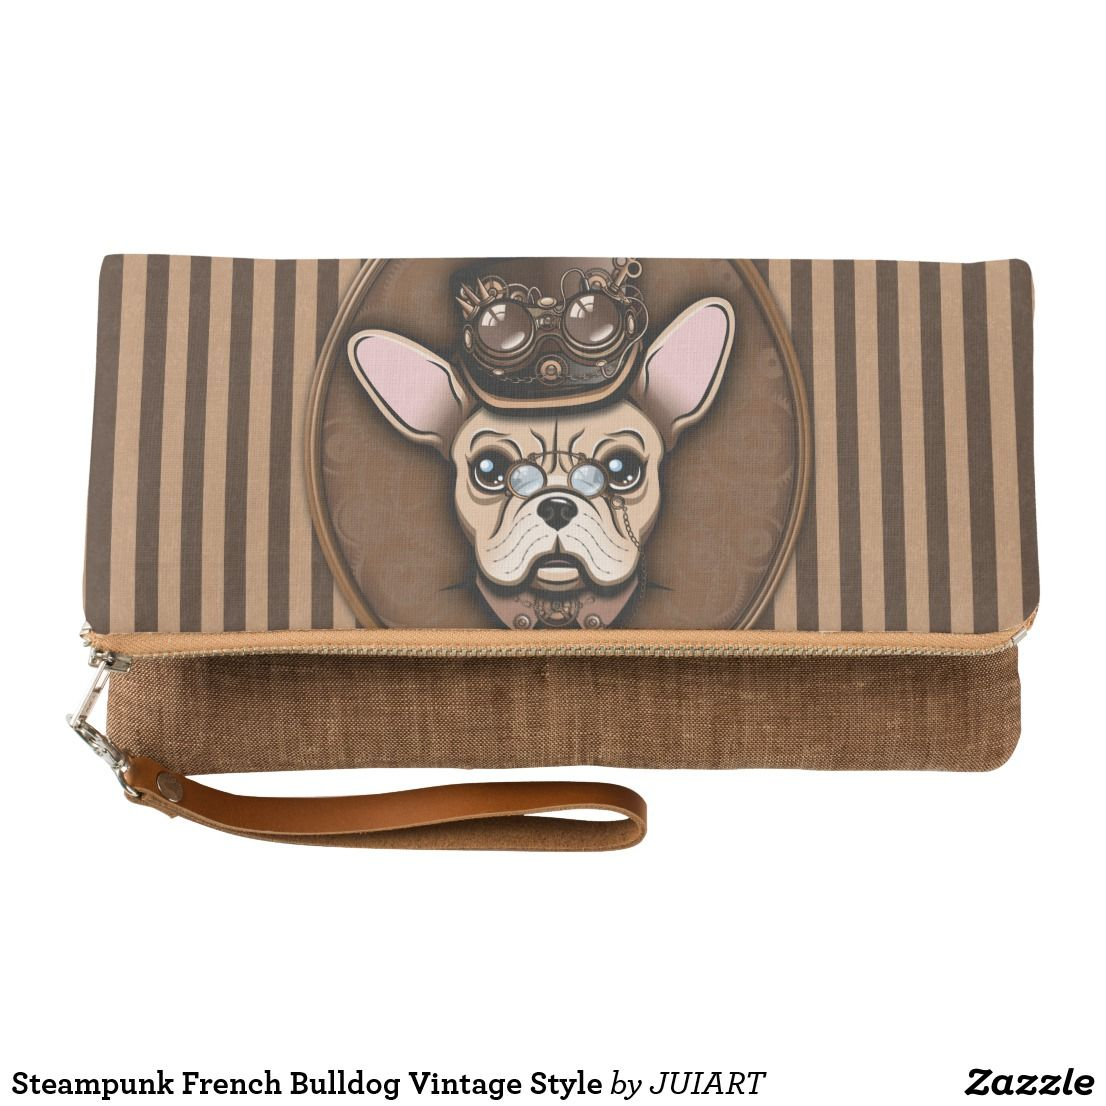 Steampunk French Bulldog Vintage Styles Clutch Zazzle Com